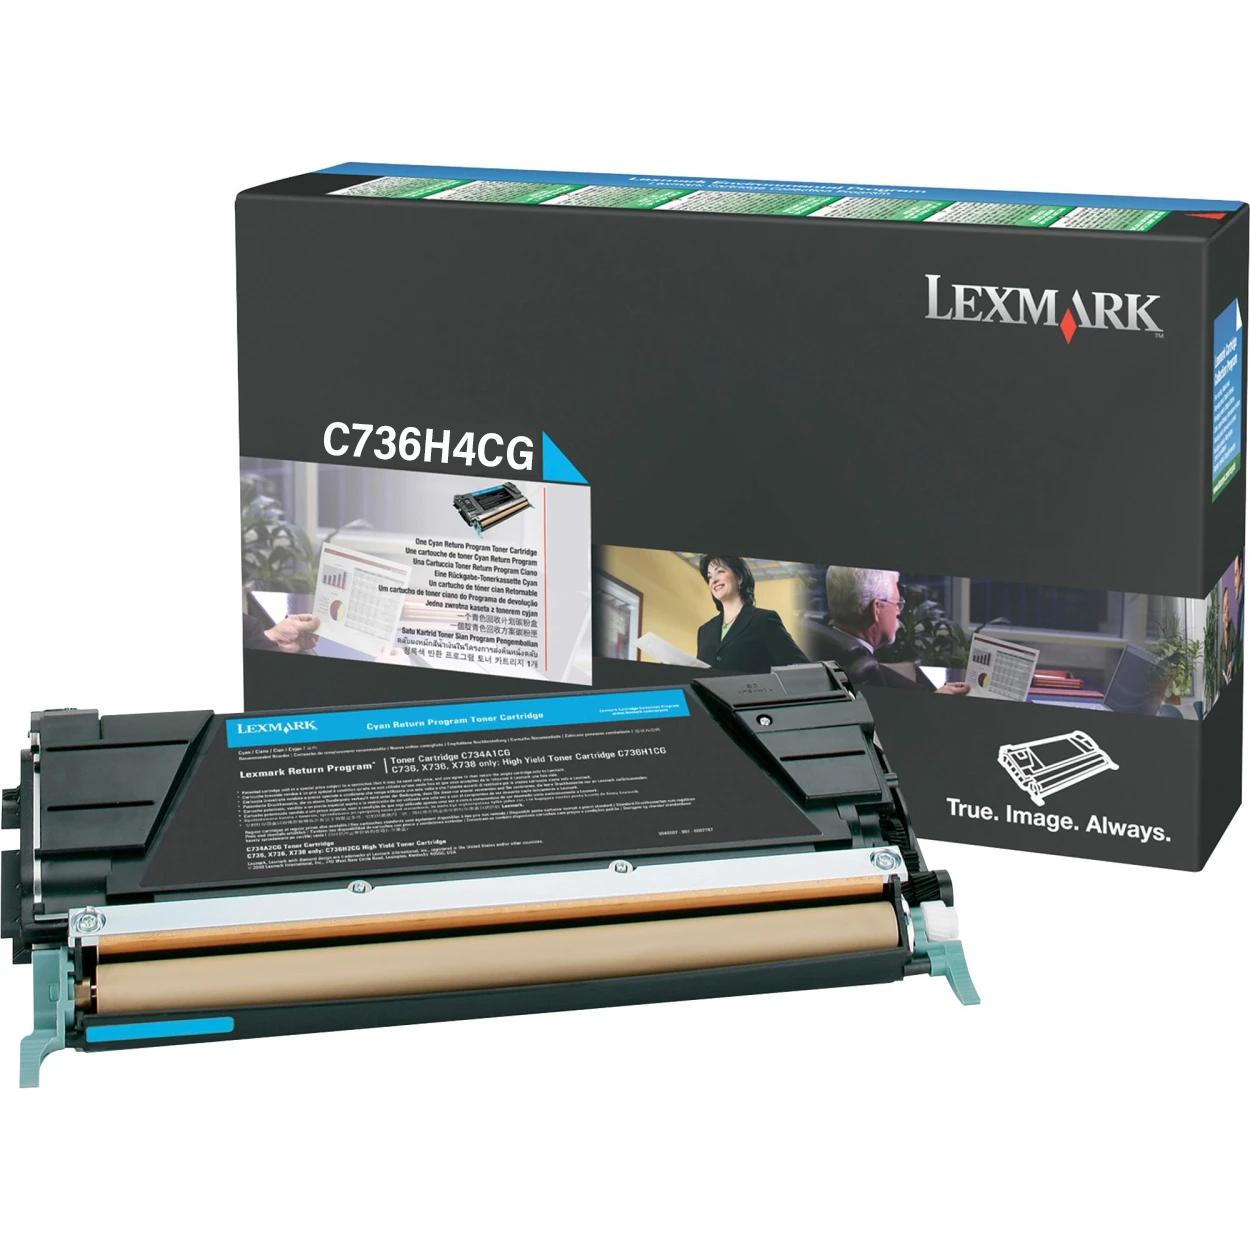 Original Lexmark C736H4CG C736 Cyan Return Program High-Yield Toner Cartridge